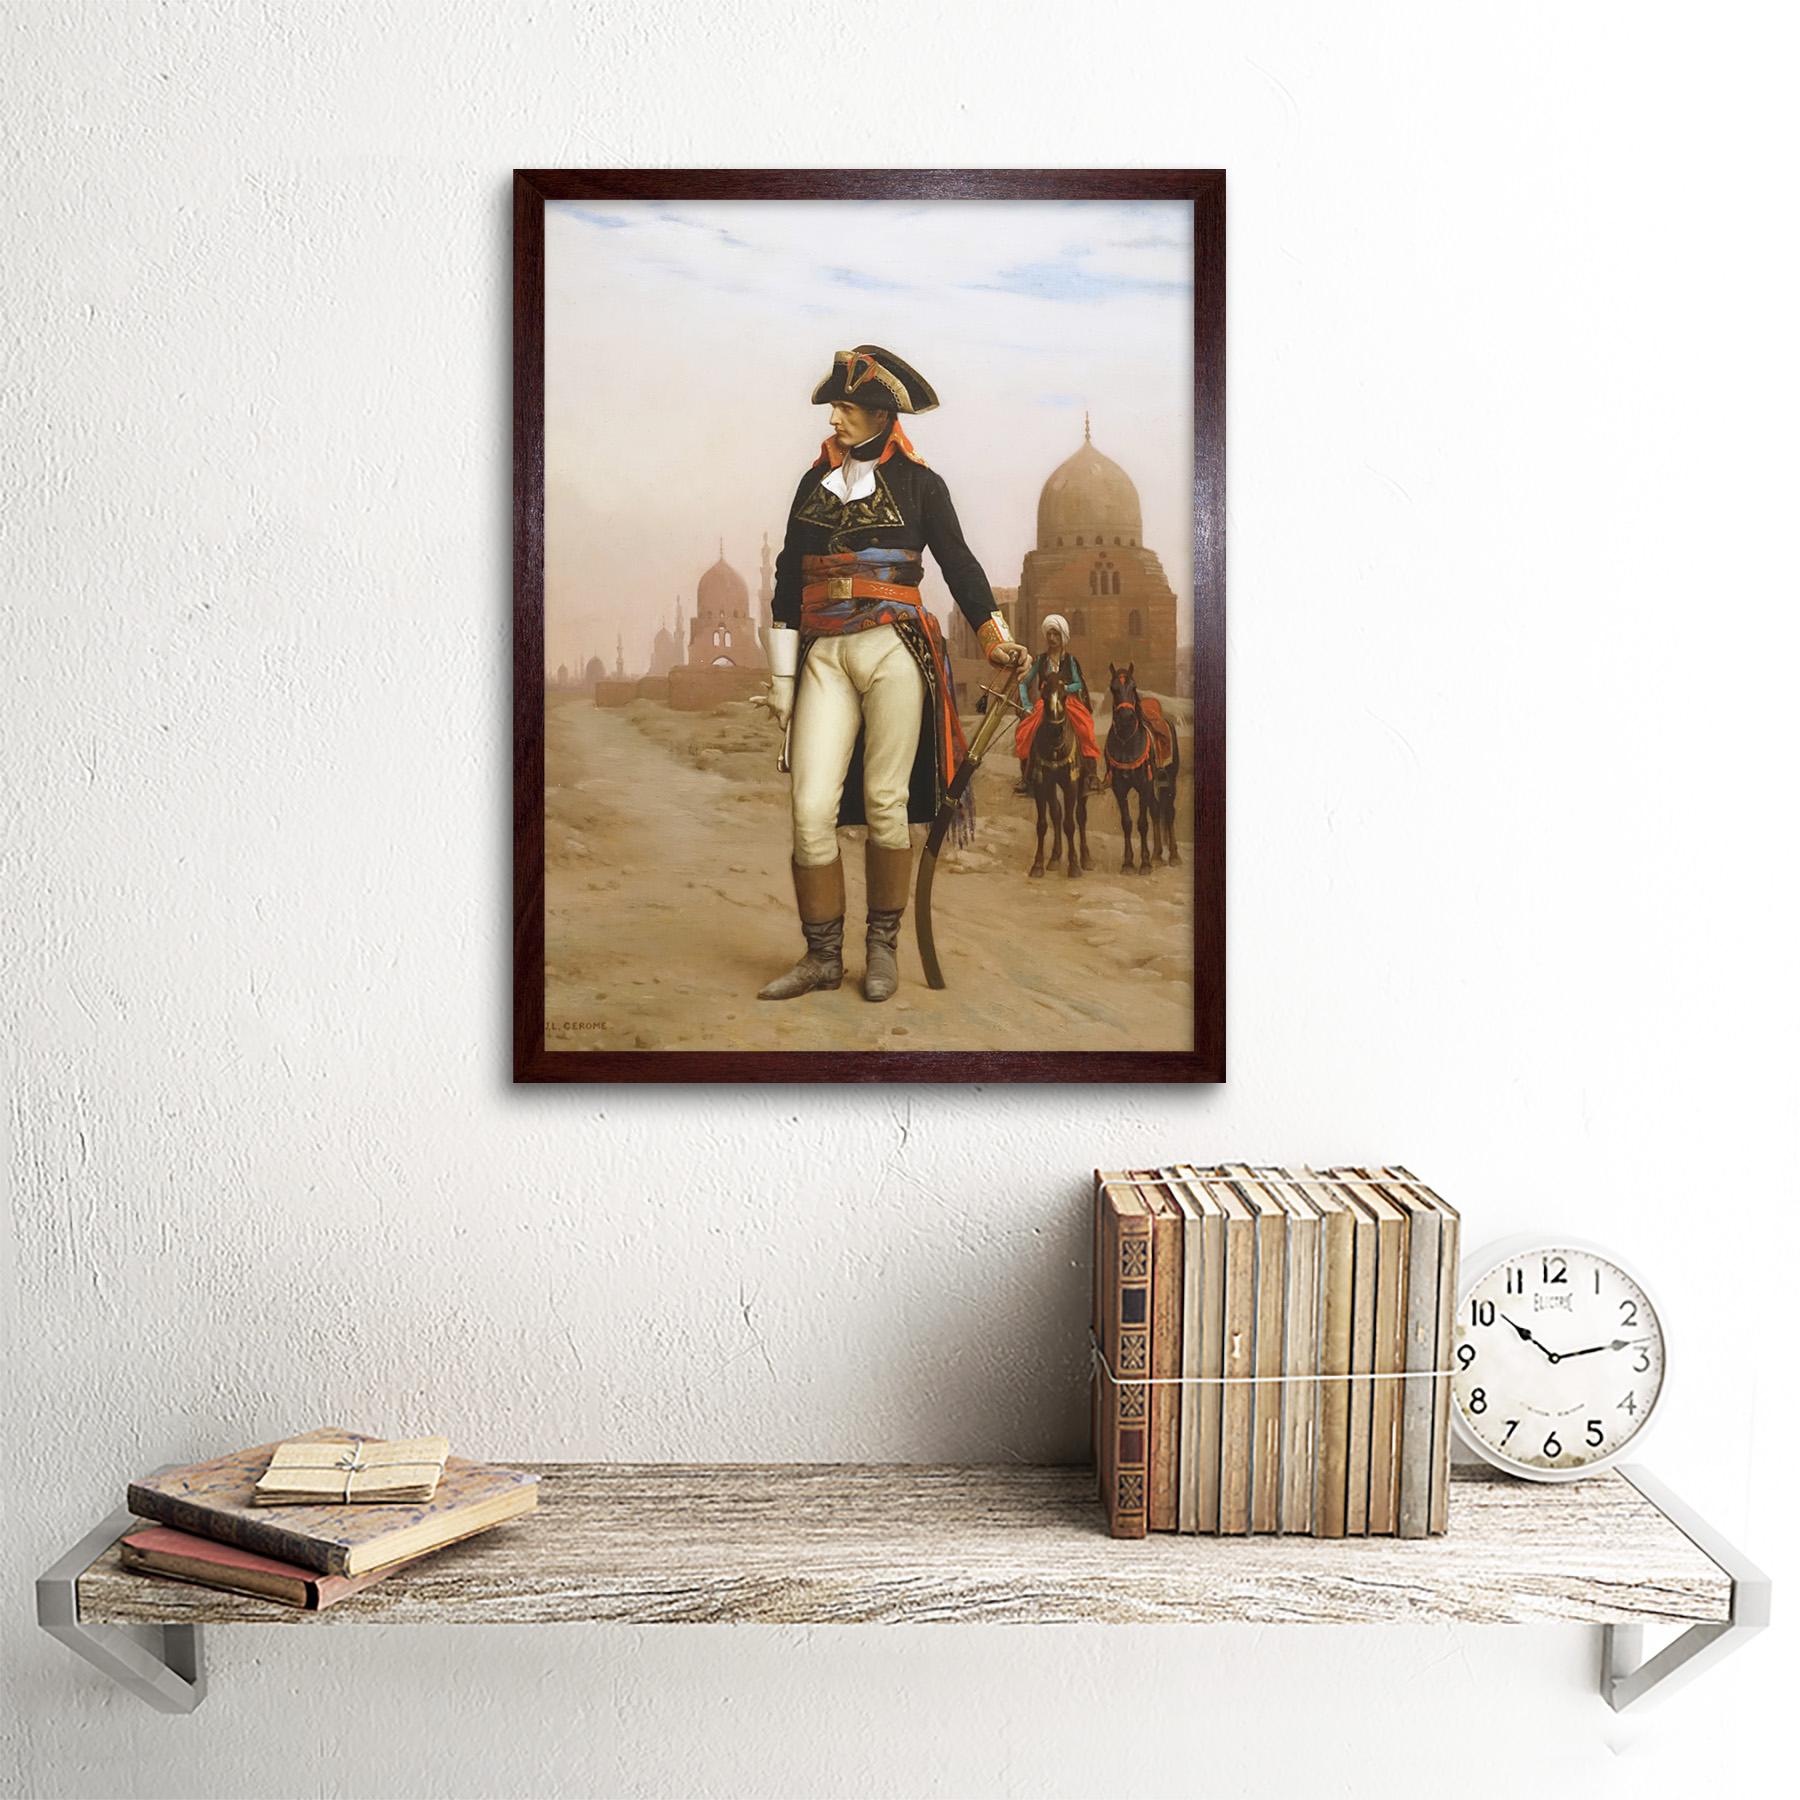 Gerome-Napoleon-Bonaparte-In-Egypt-Painting-Art-Print-Framed-12x16 thumbnail 8